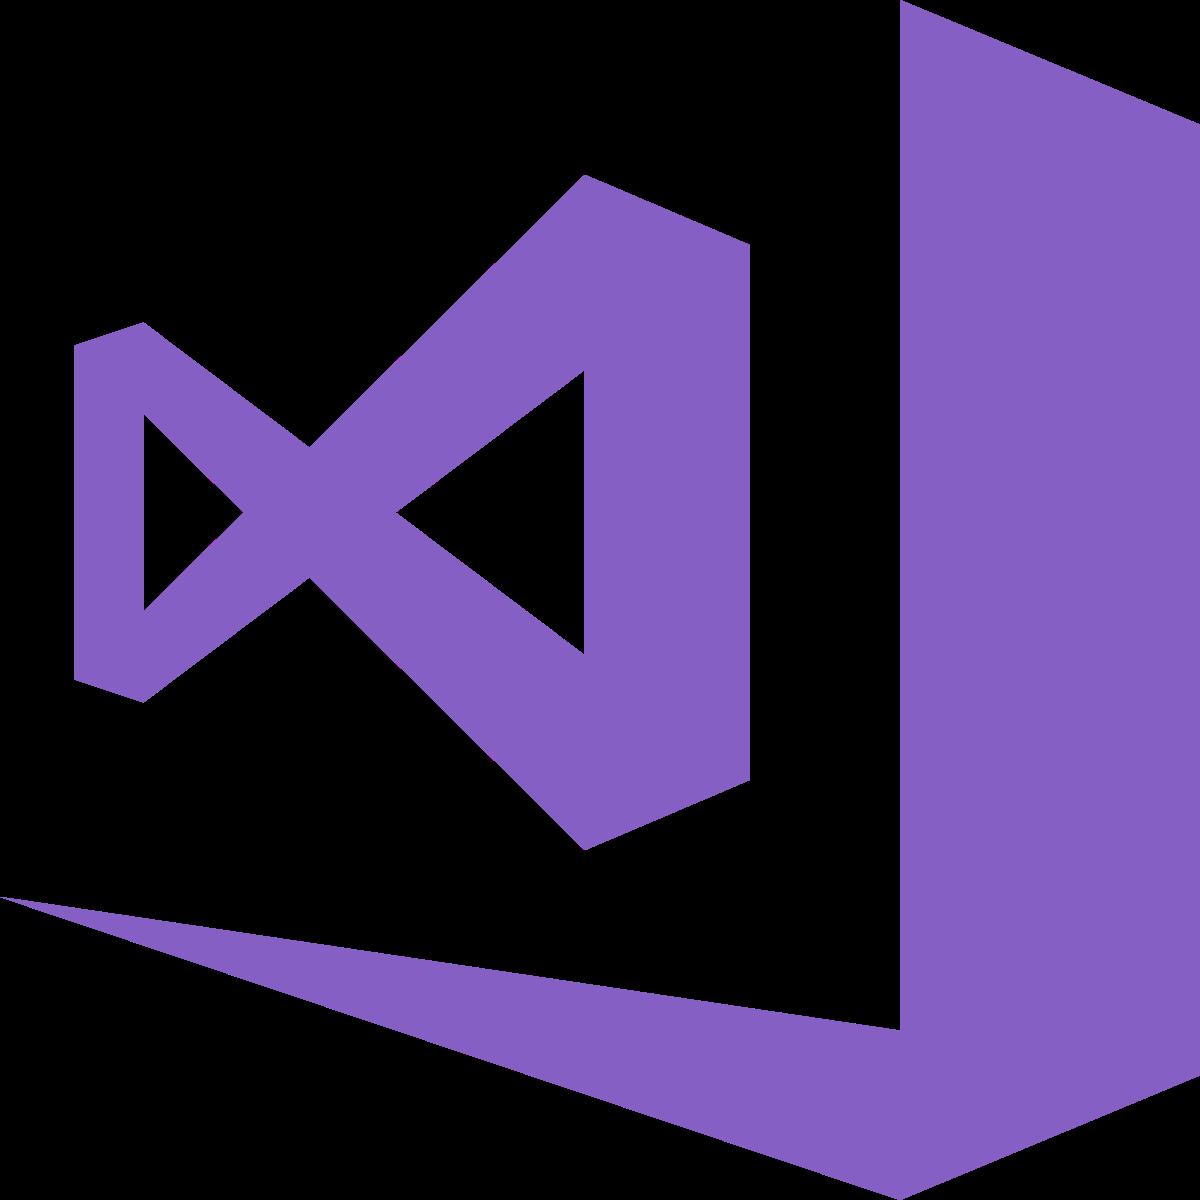 Microsoft Visual Studio 2019 16.8.5 Crack Free Download